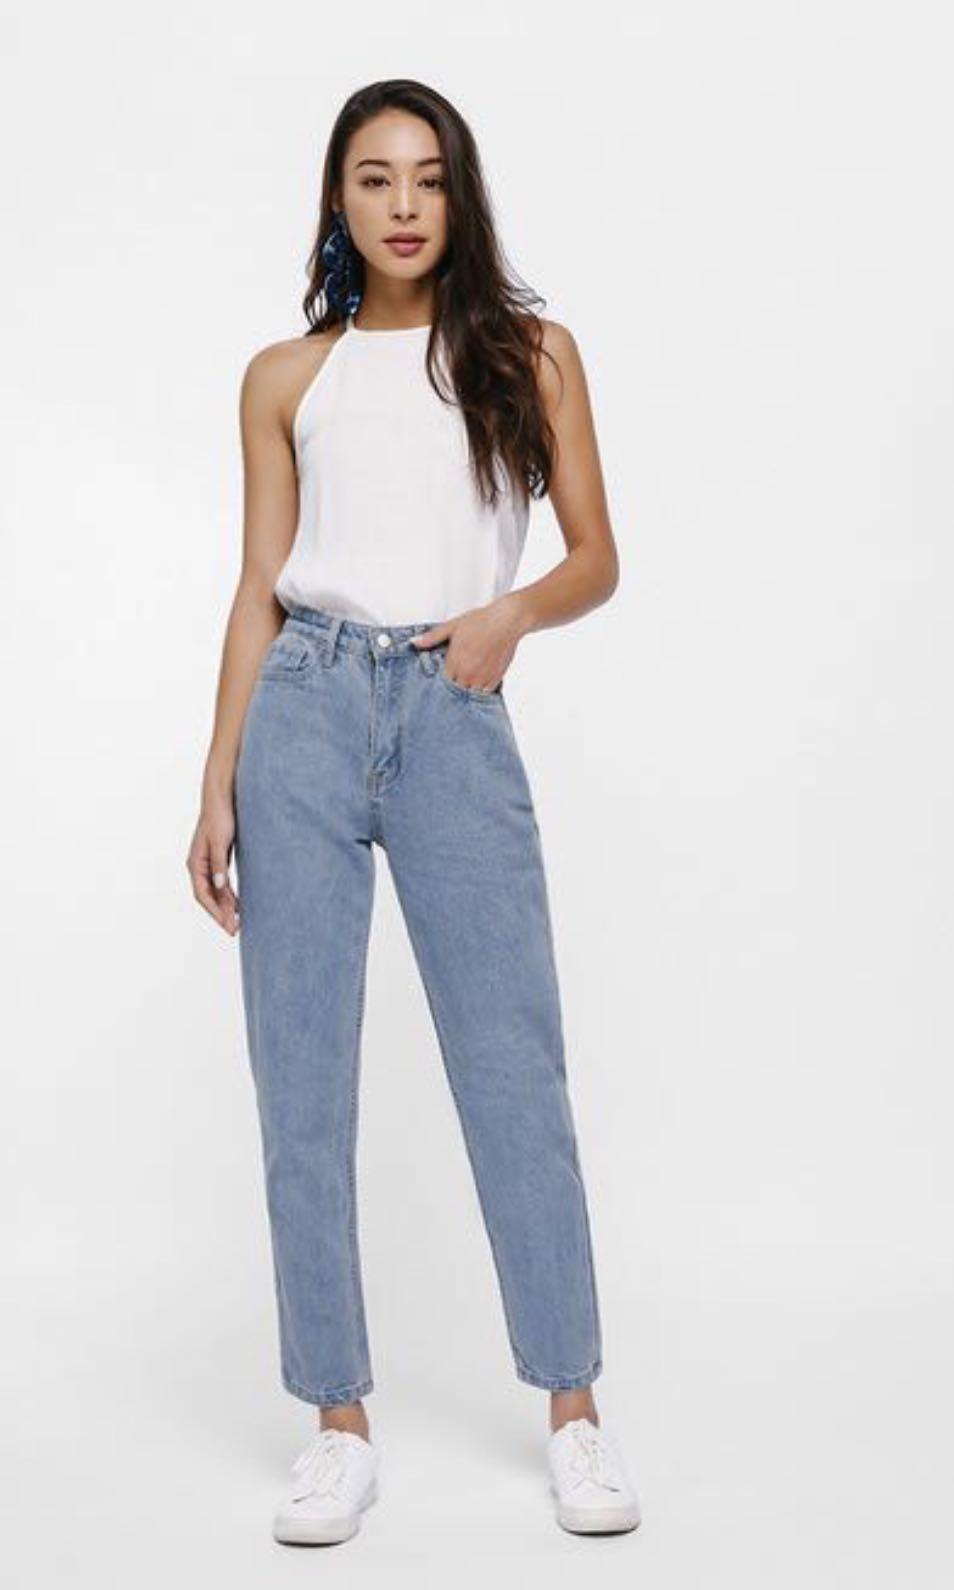 c9c1e39b615 BNWT Love bonito Martha mom jeans 24